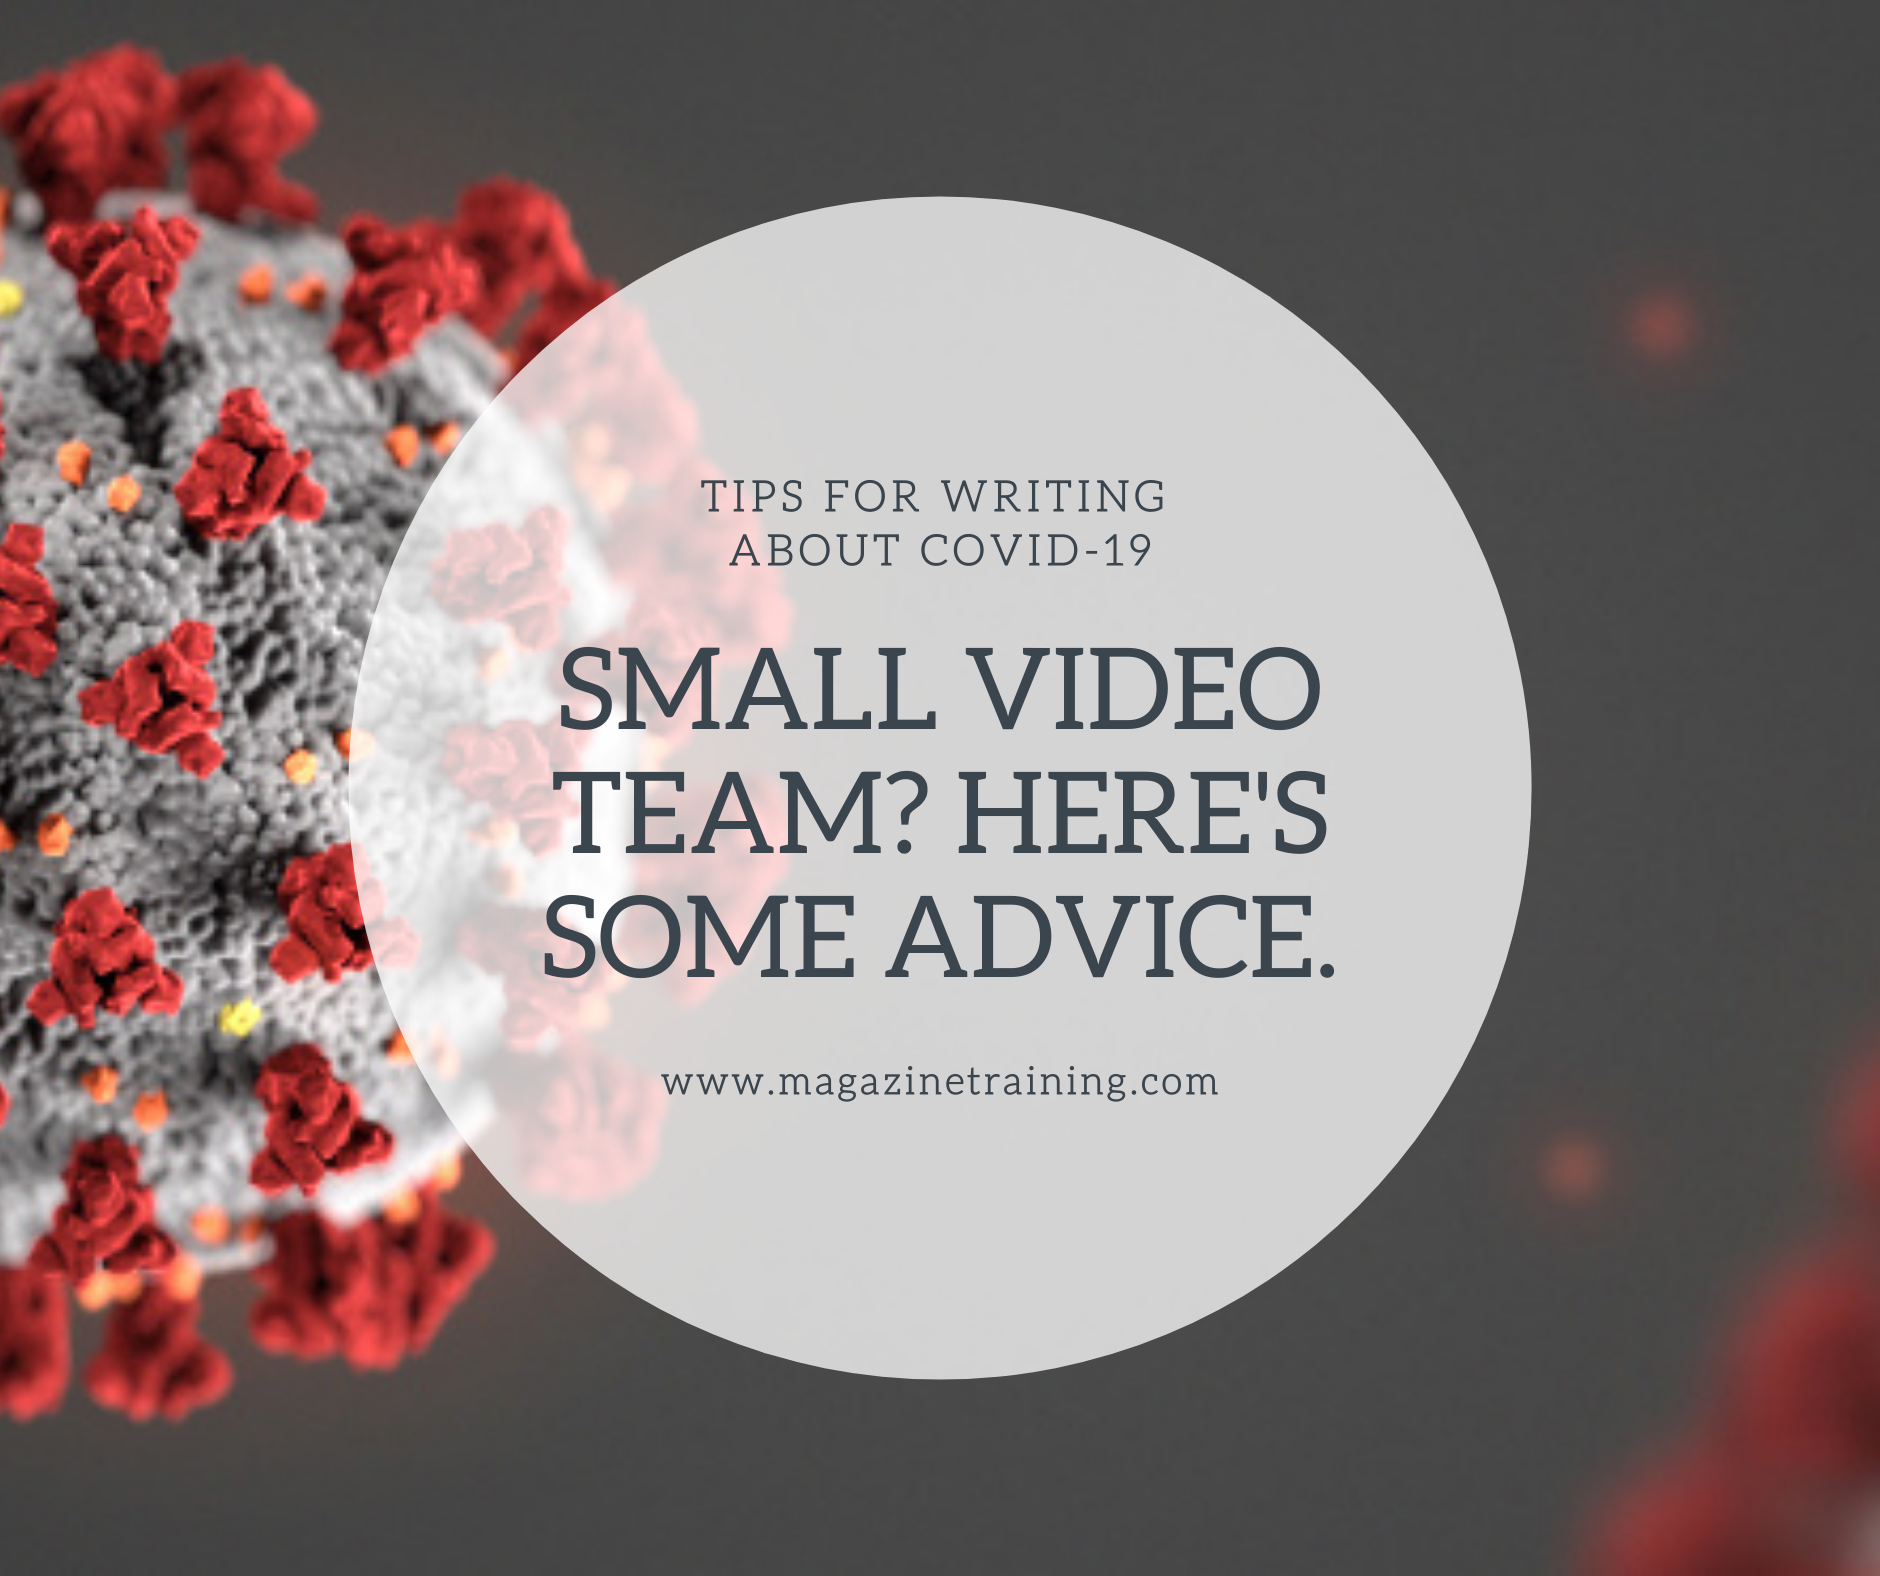 small video team advice